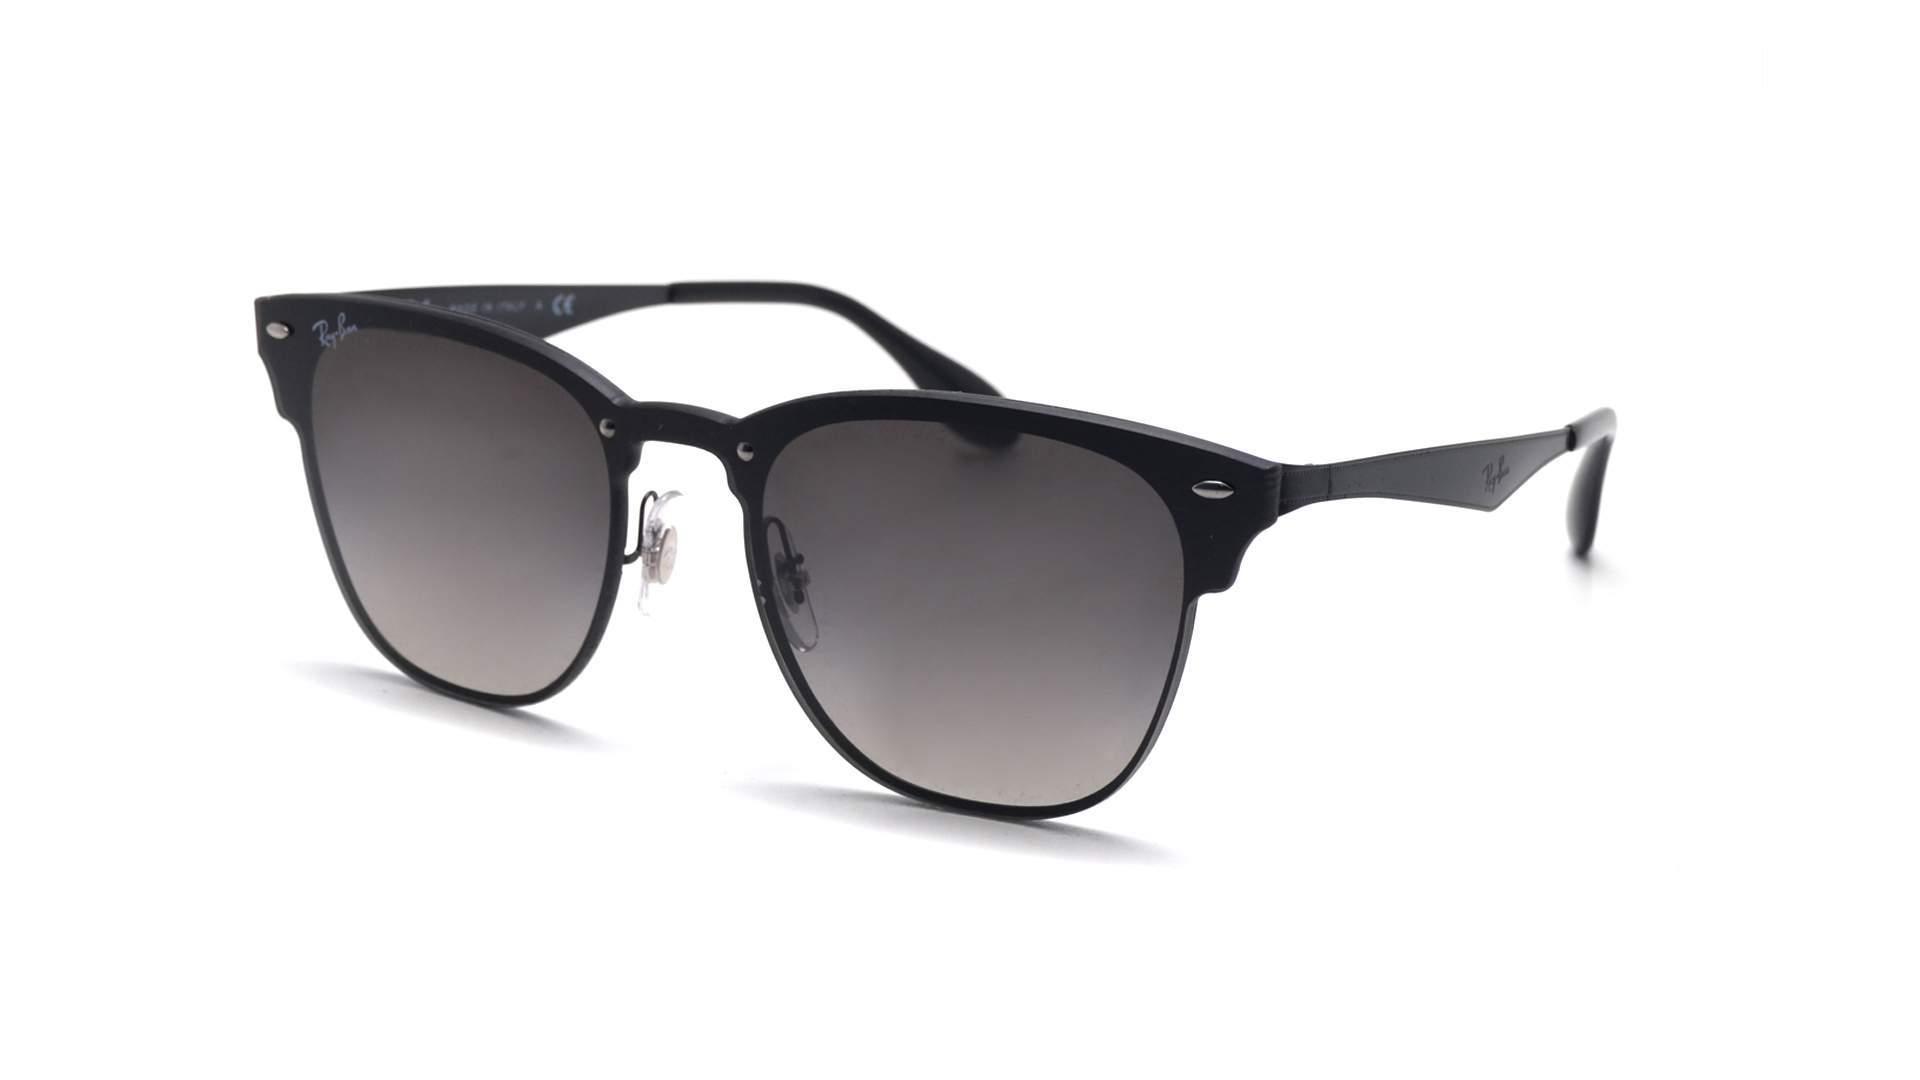 d5075b494c Sunglasses Ray-Ban Clubmaster Blaze Black RB3576N 153 11 Large Mirror